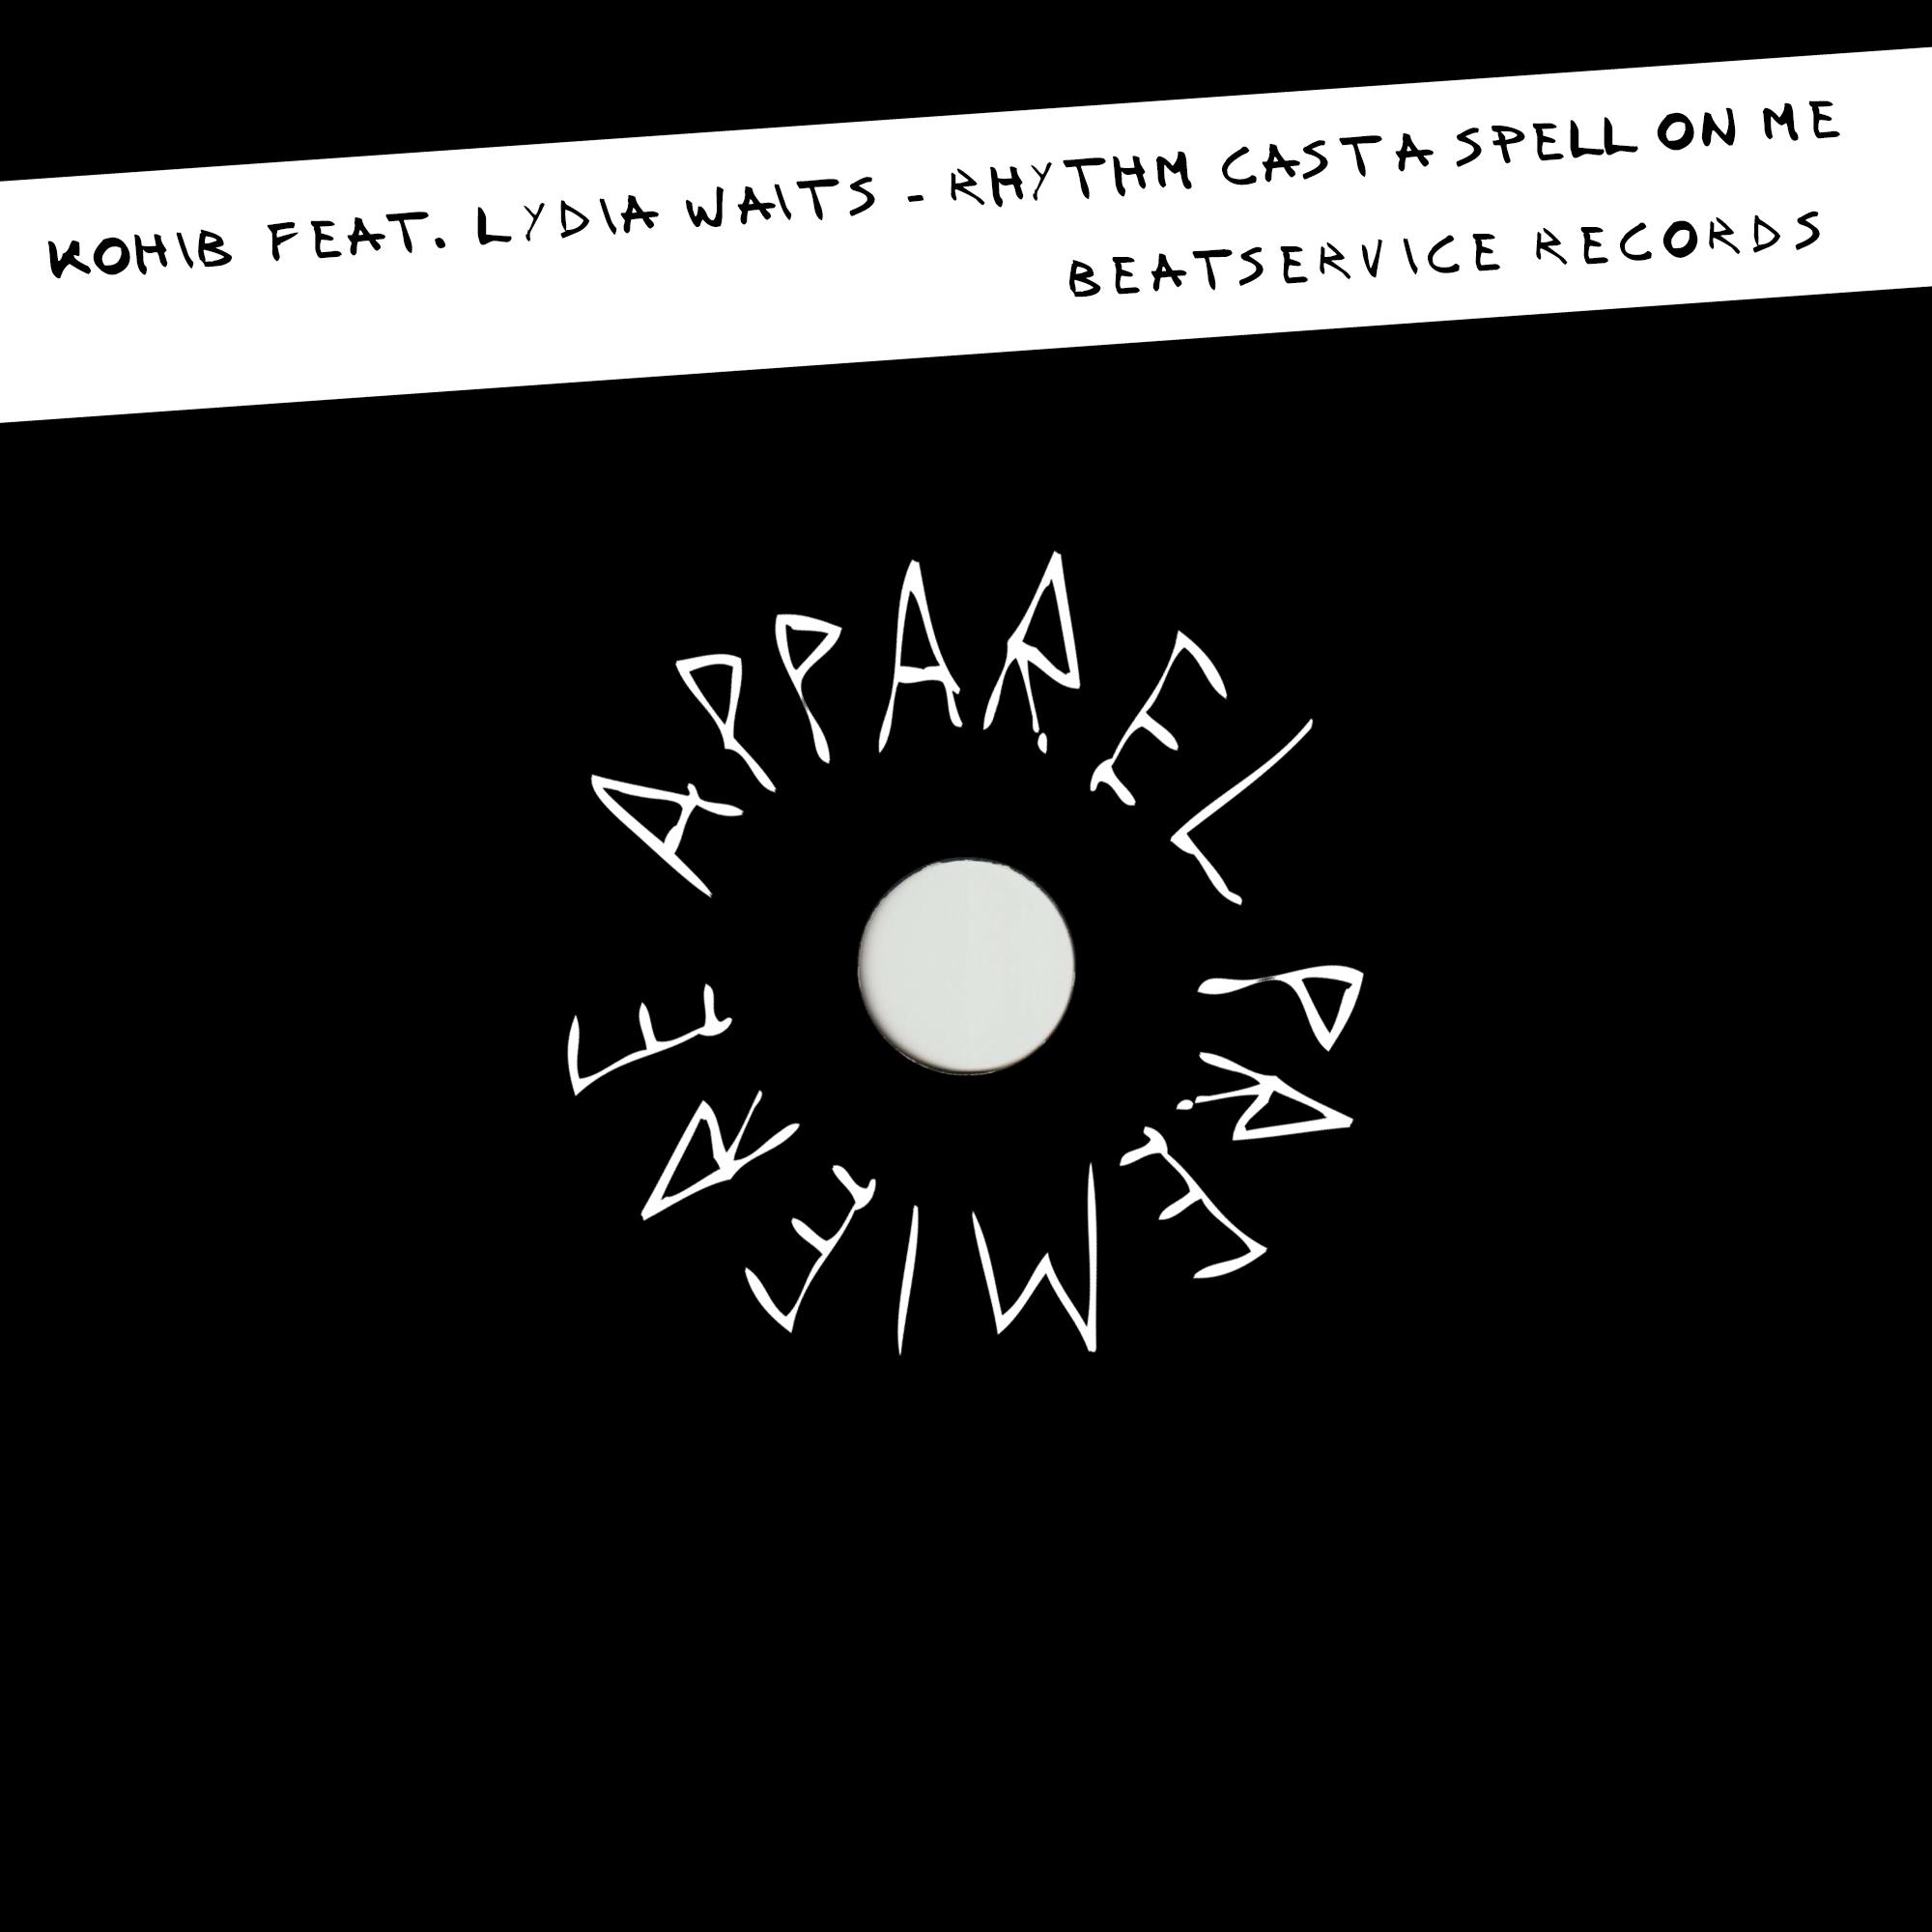 APPAREL PREMIERE Beatservice Records